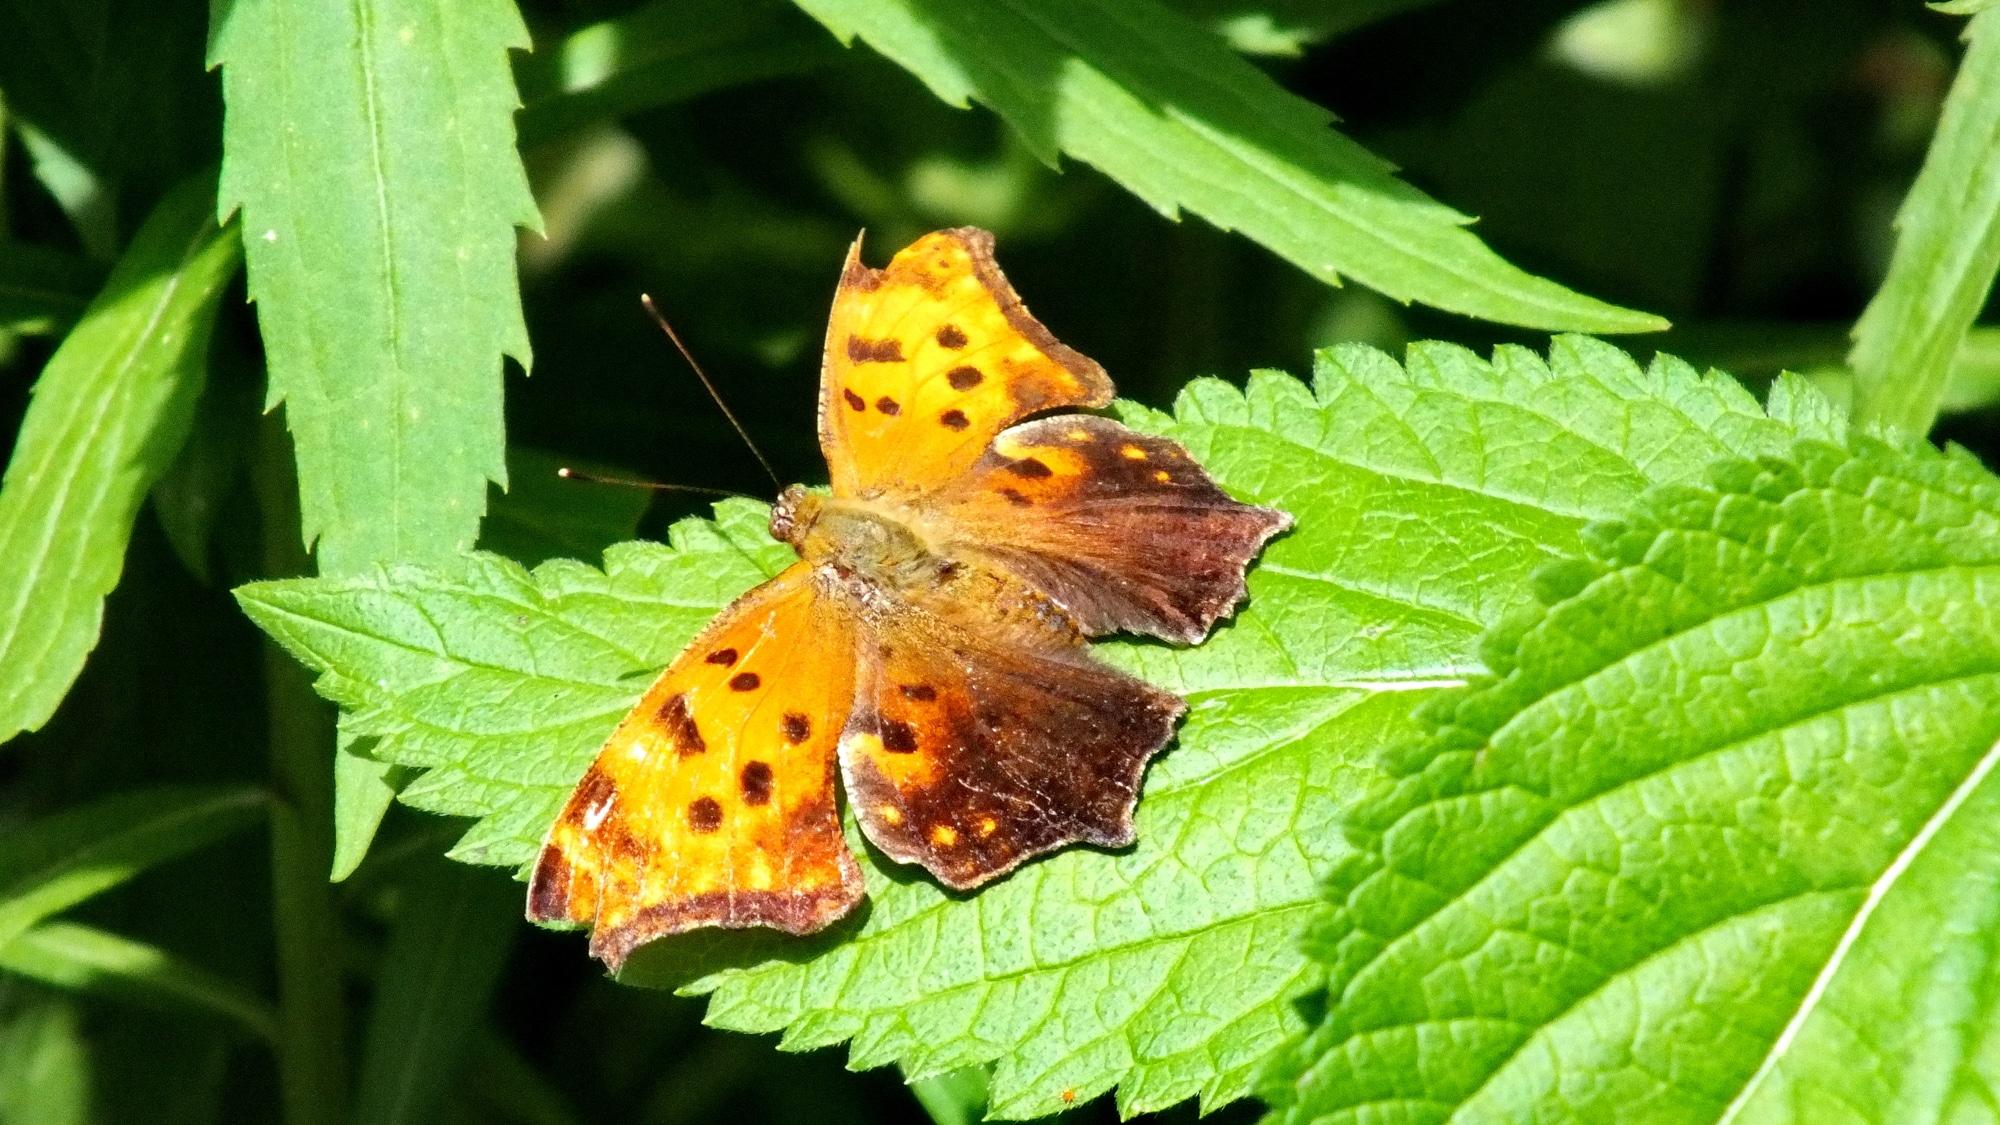 Eastern Comma Butterfly in the wild in Toronto